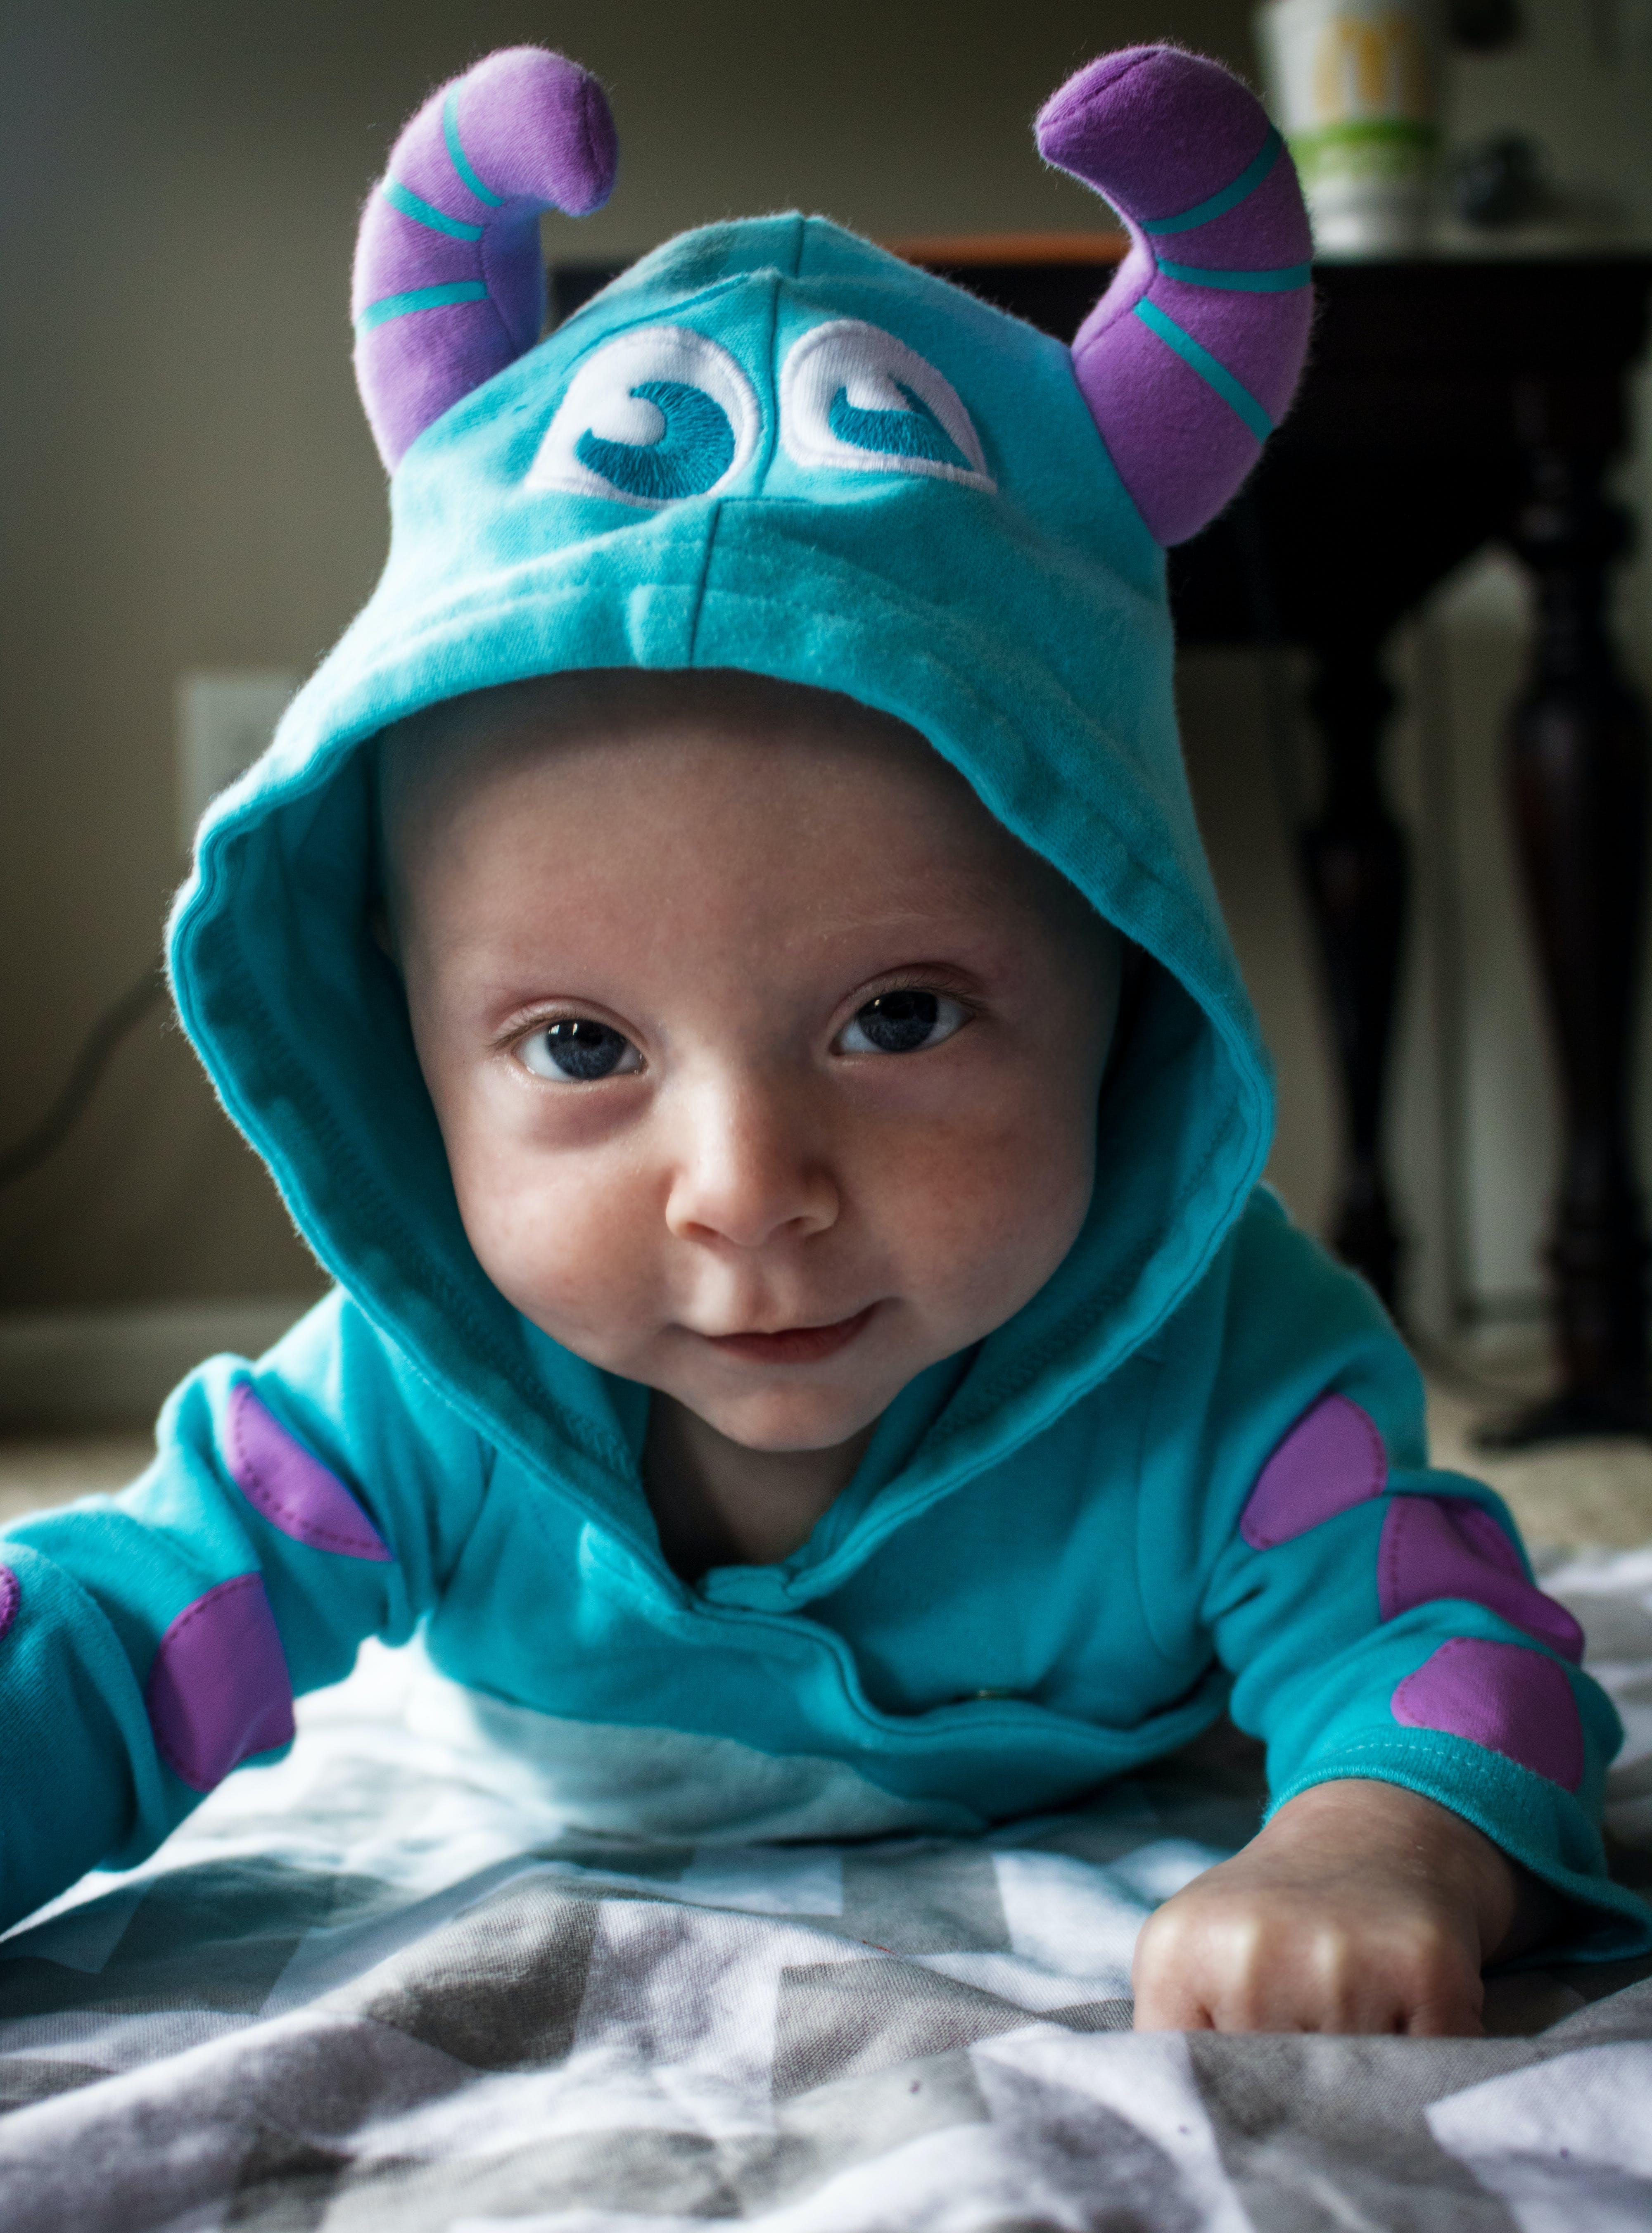 Free stock photo of cute, eyes, sweet, monster